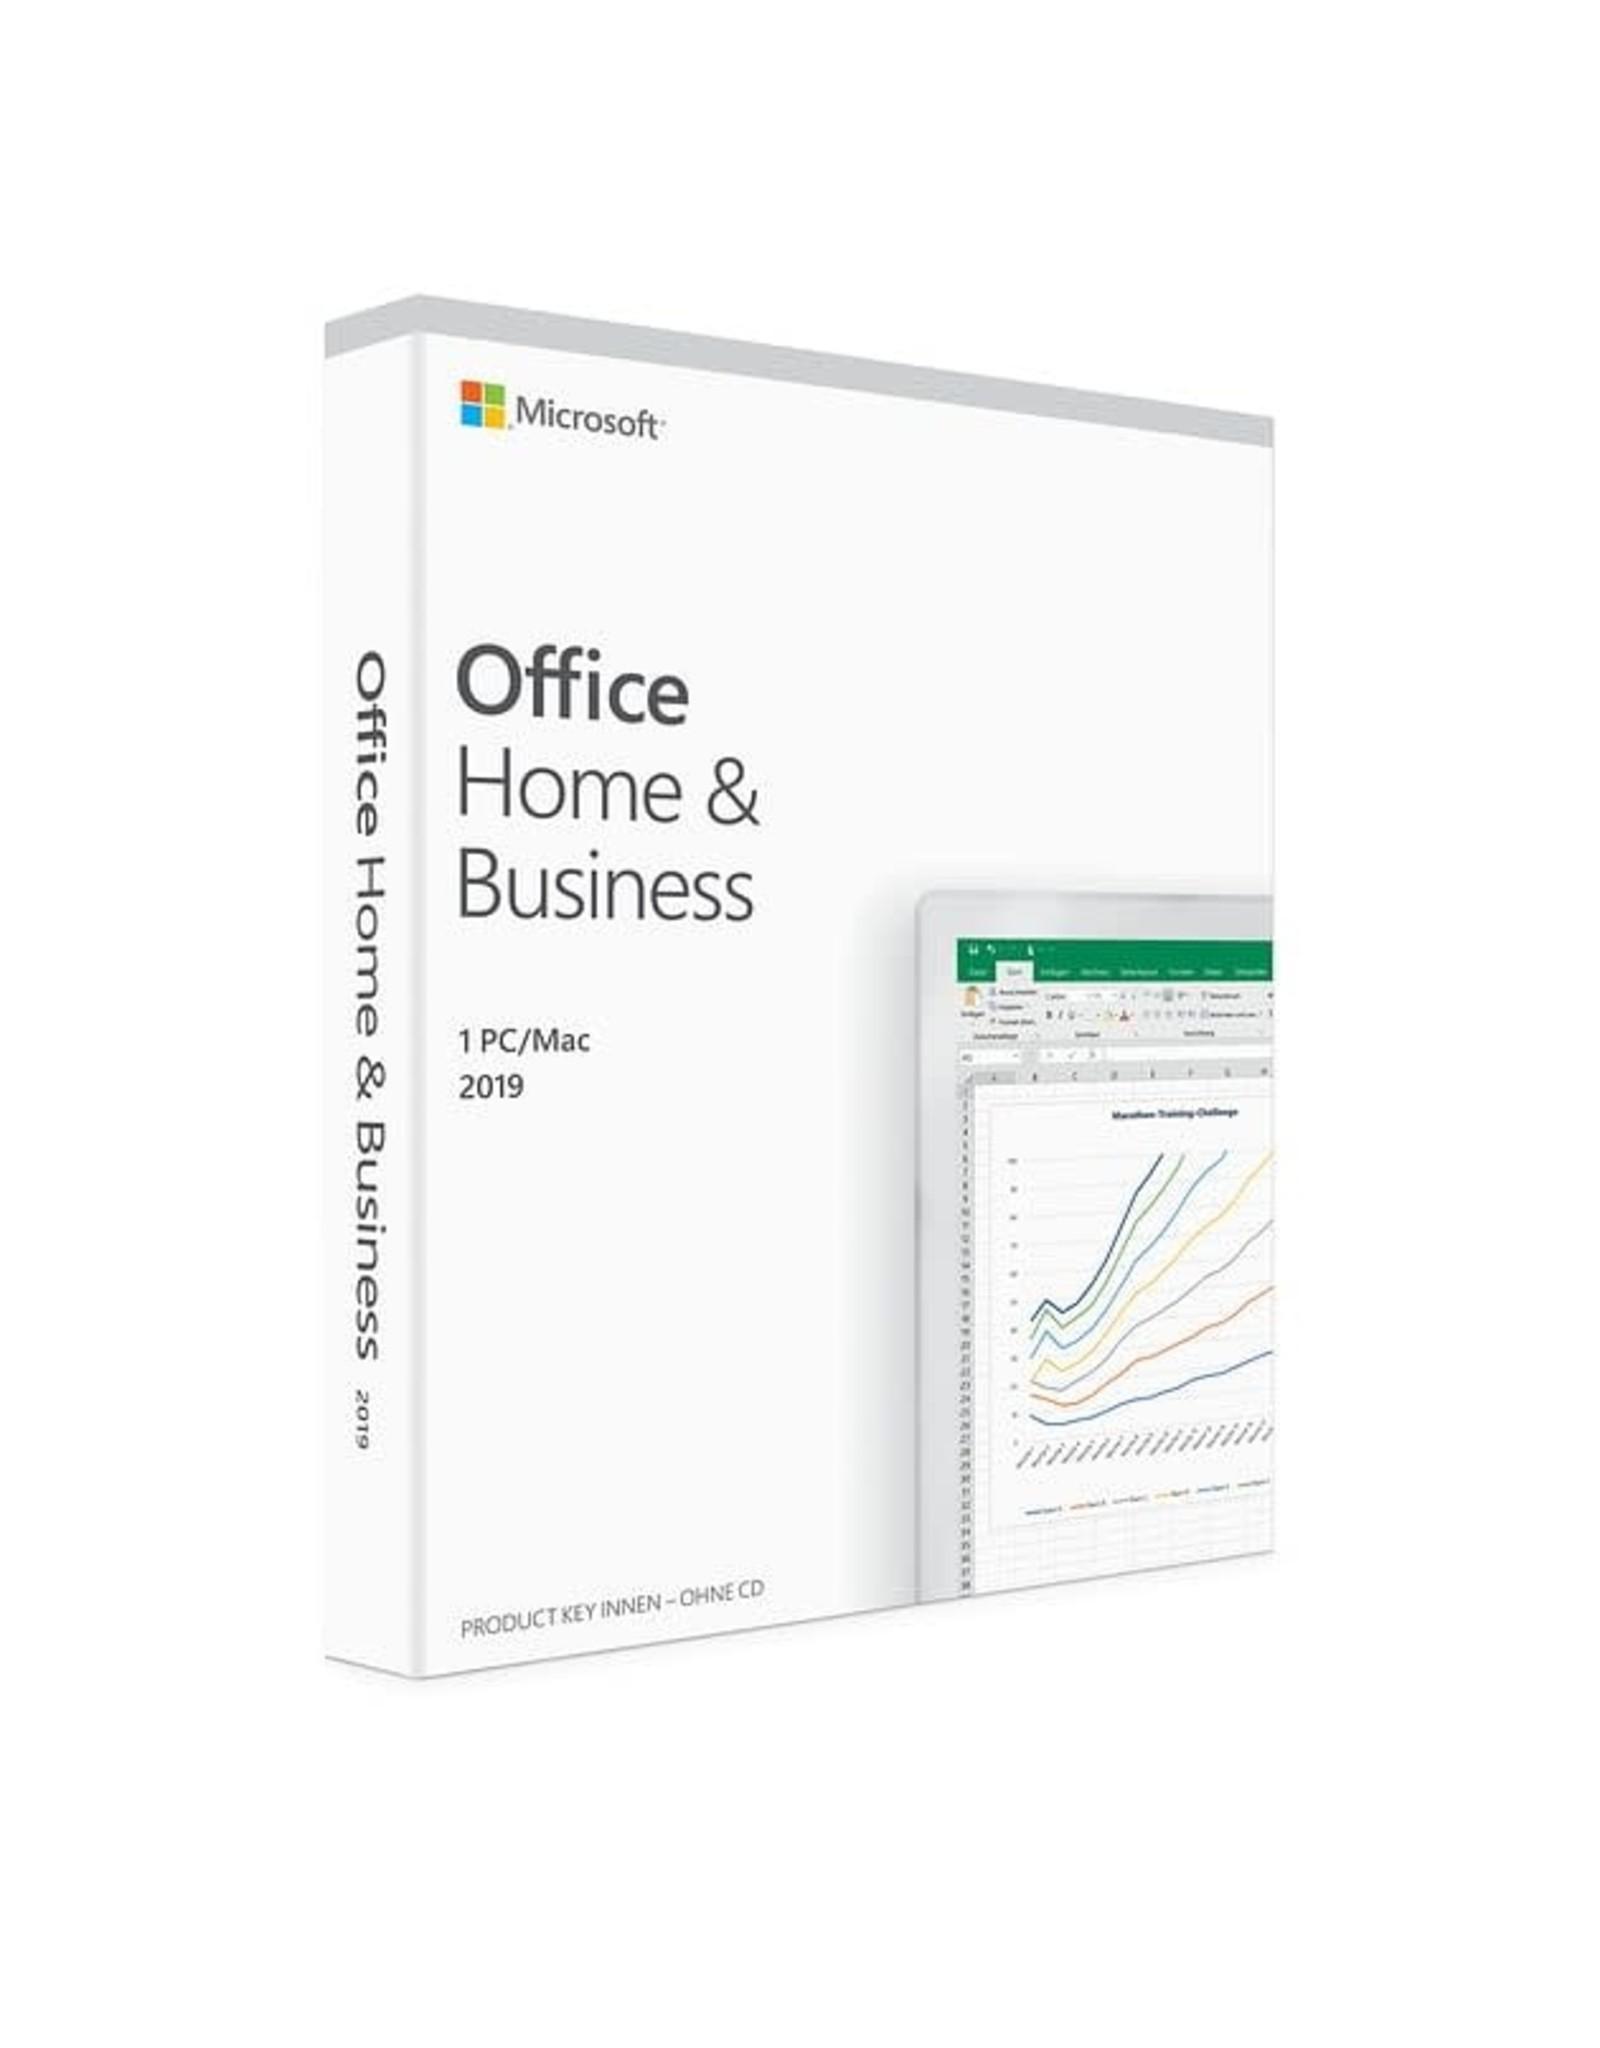 Microsoft Microsoft Office Home & Business 2019 (inc. Outlook) - 1 PC/Mac